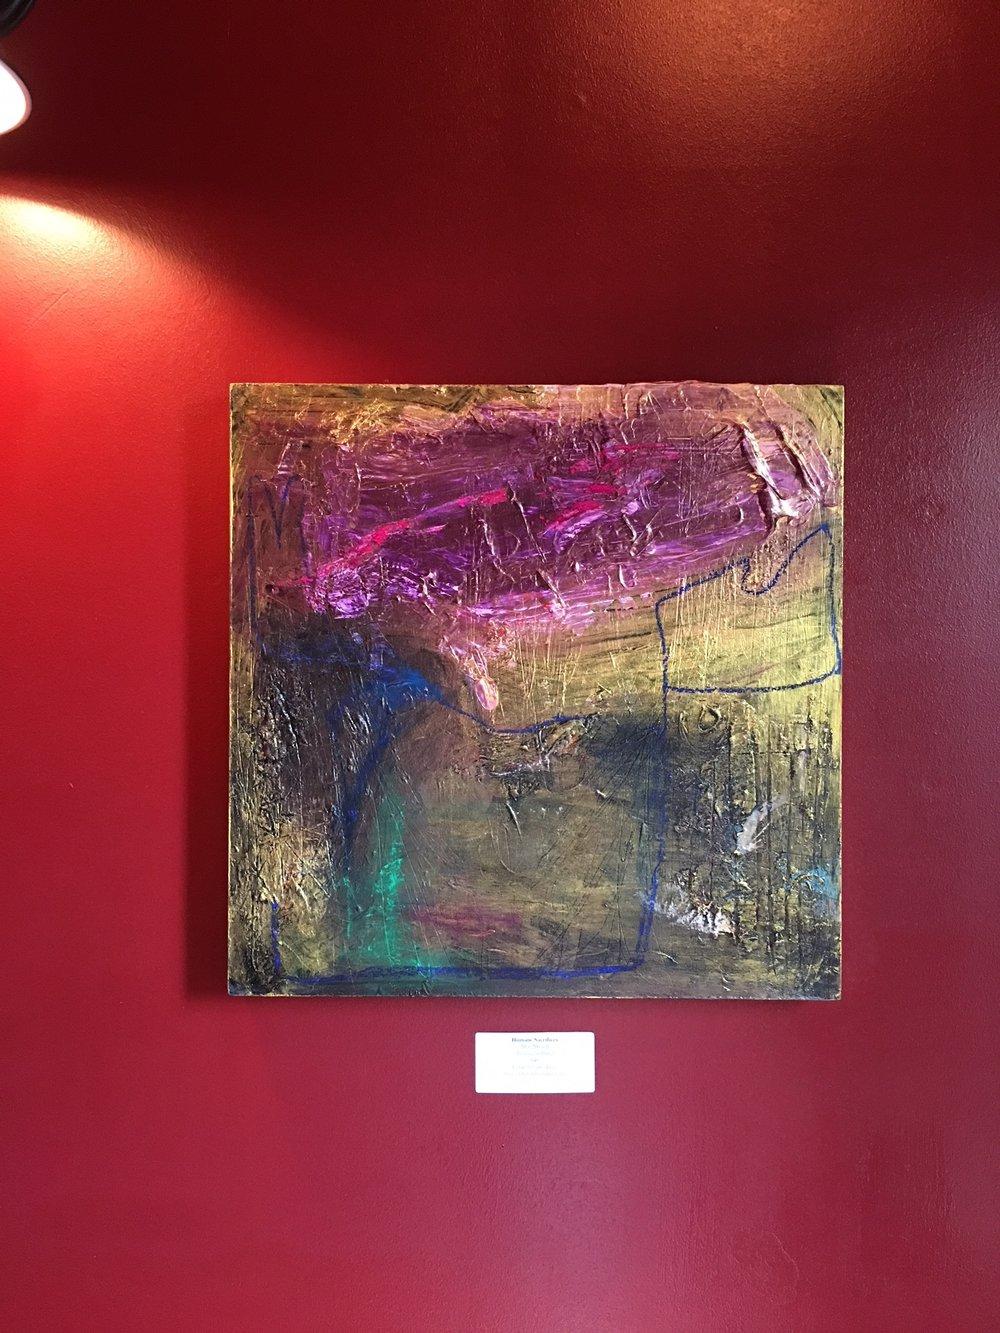 Humane Sacrafices | $640 | 20x20